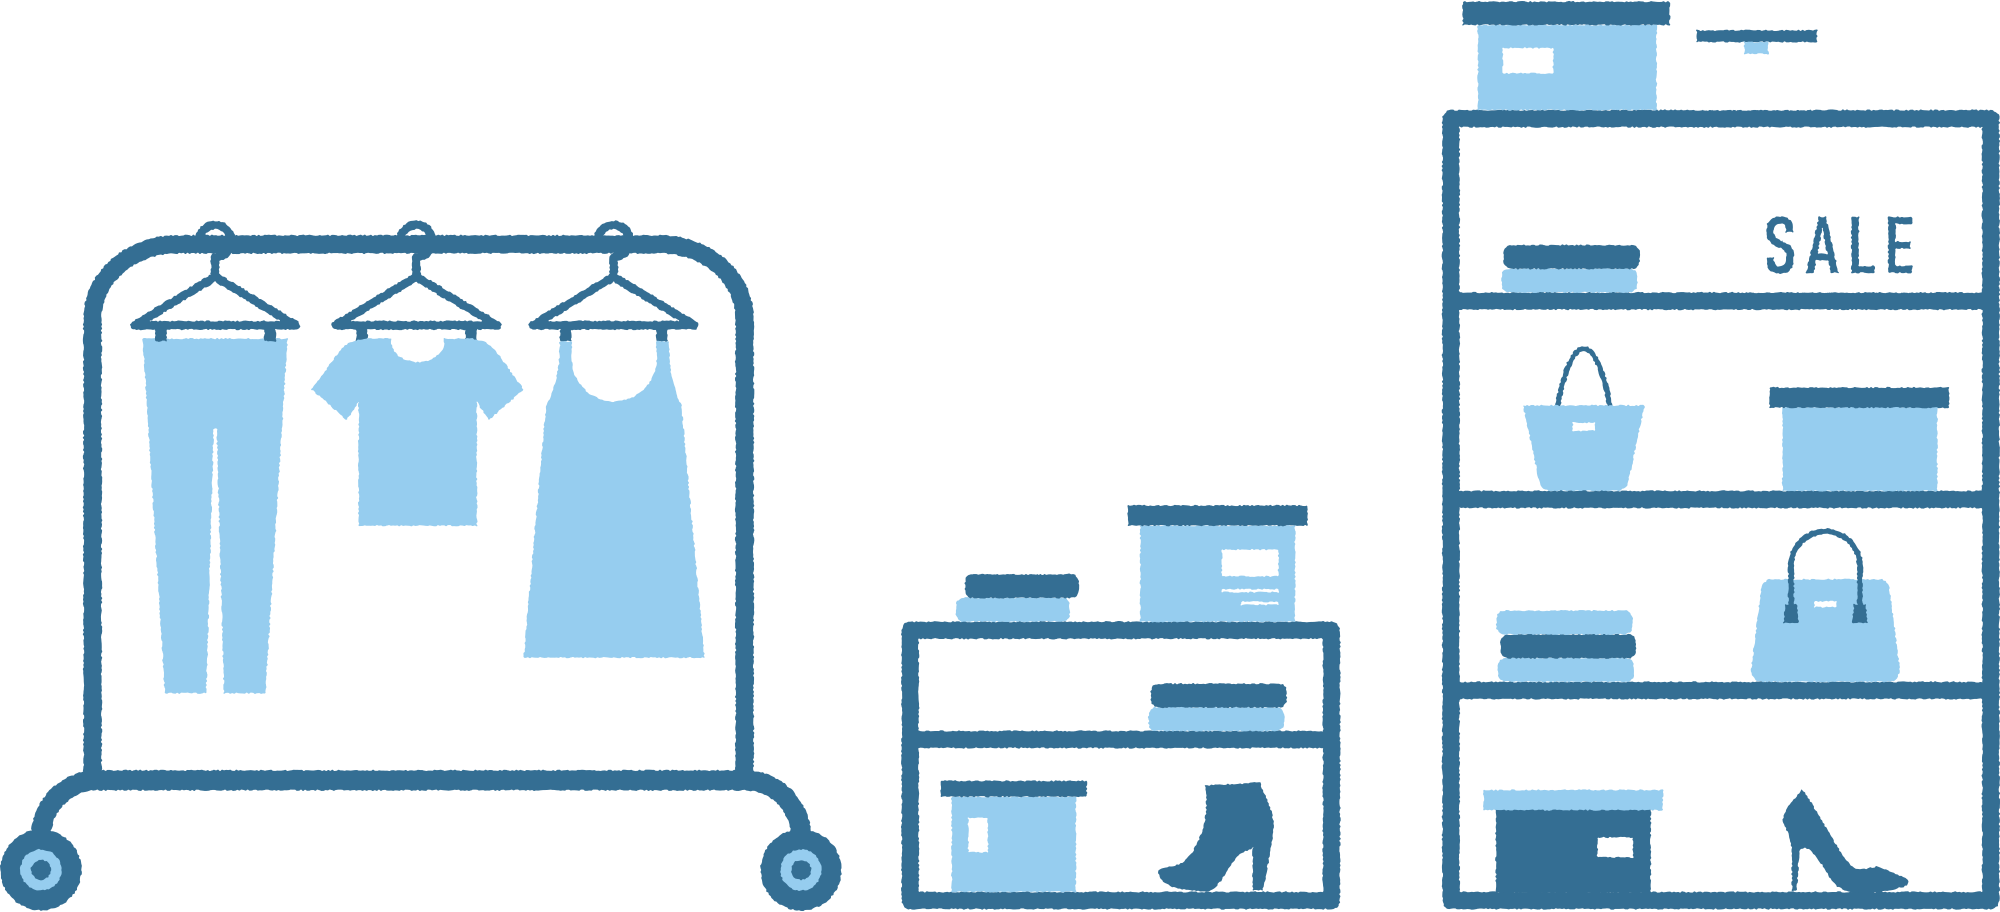 clothing shop Clipart illustration in PNG, SVG